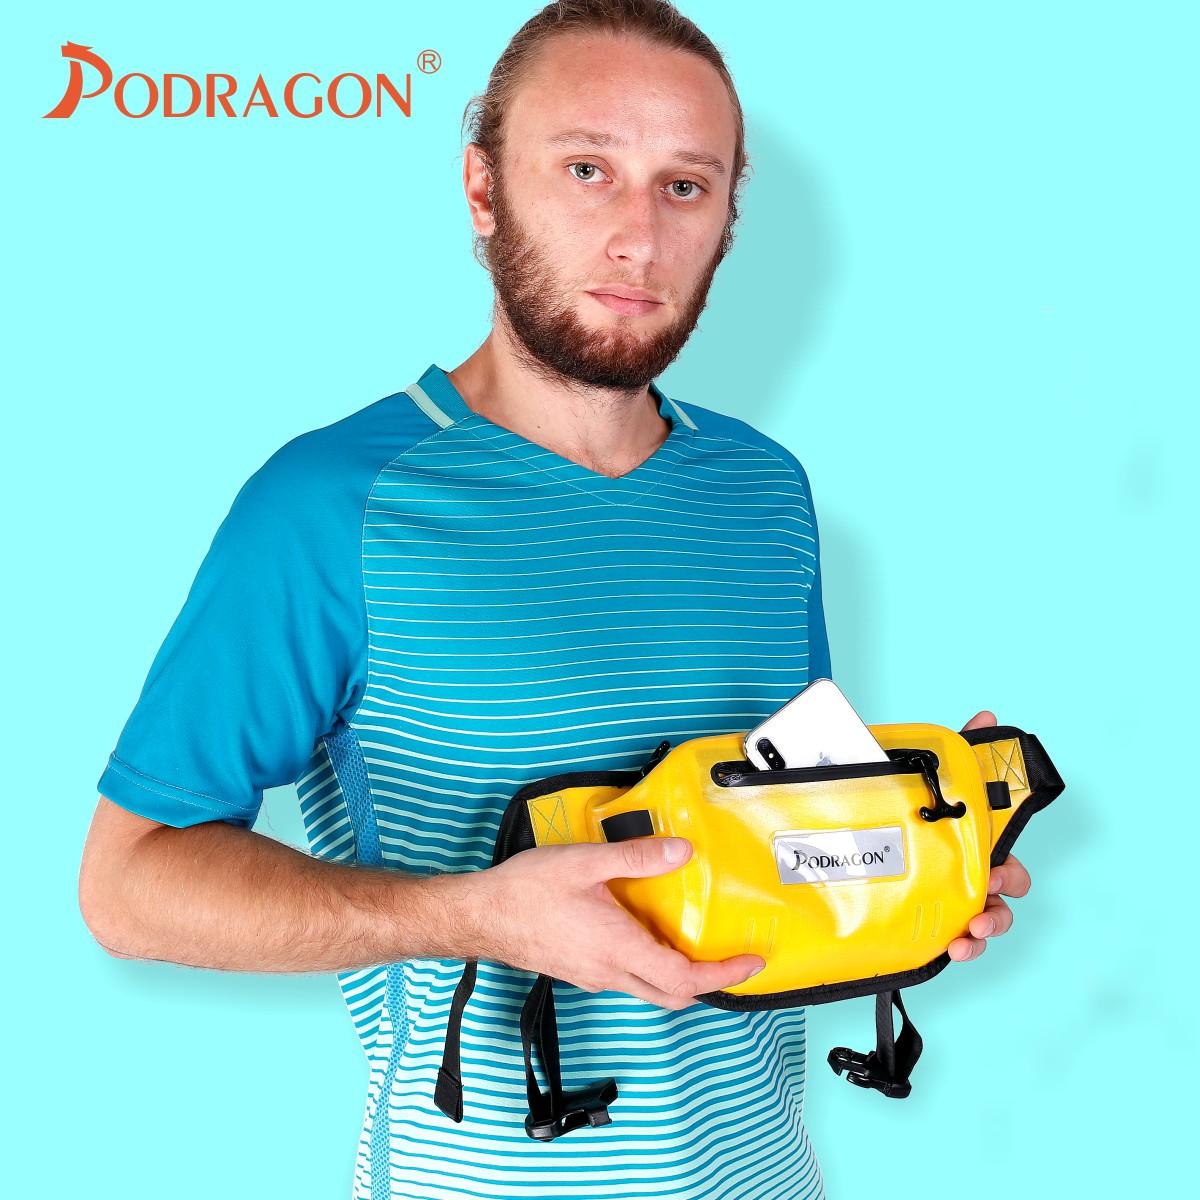 Podragon气密腰包浮潜游泳冲浪双拉链全防水腰包大容量手机防水袋